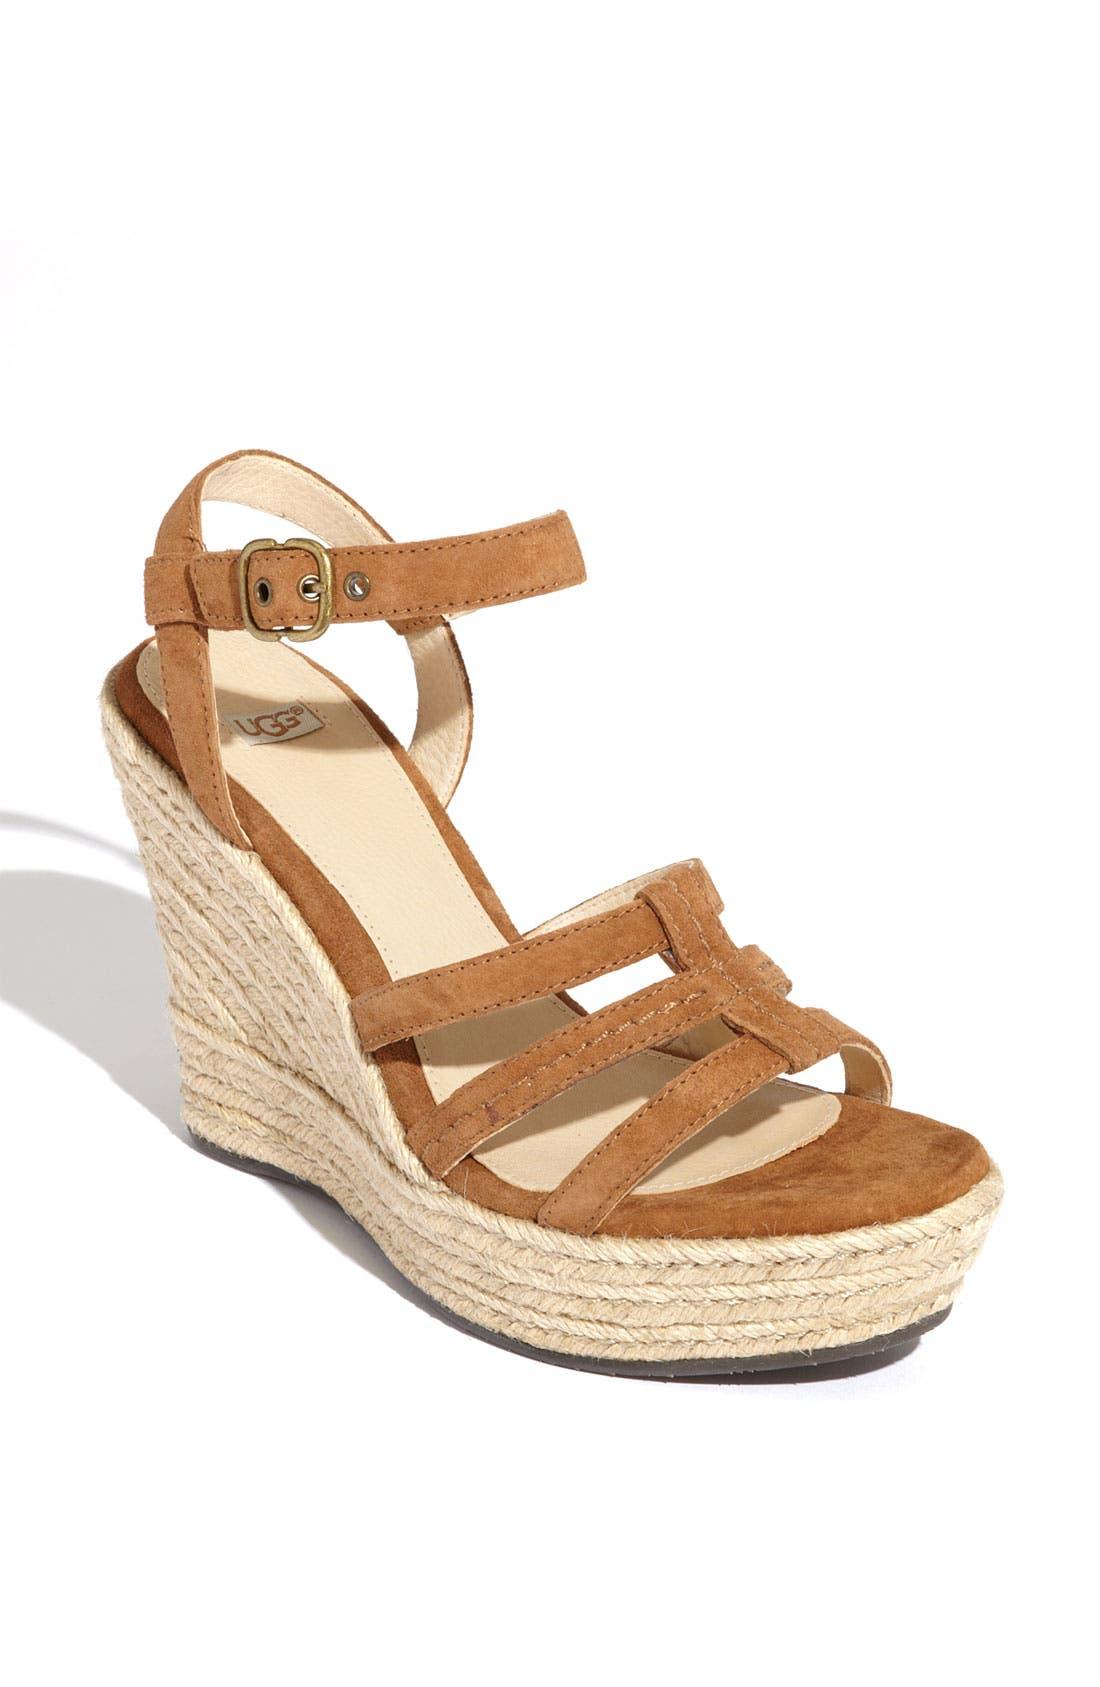 Main Image - UGG® Australia 'Callia' Sandal